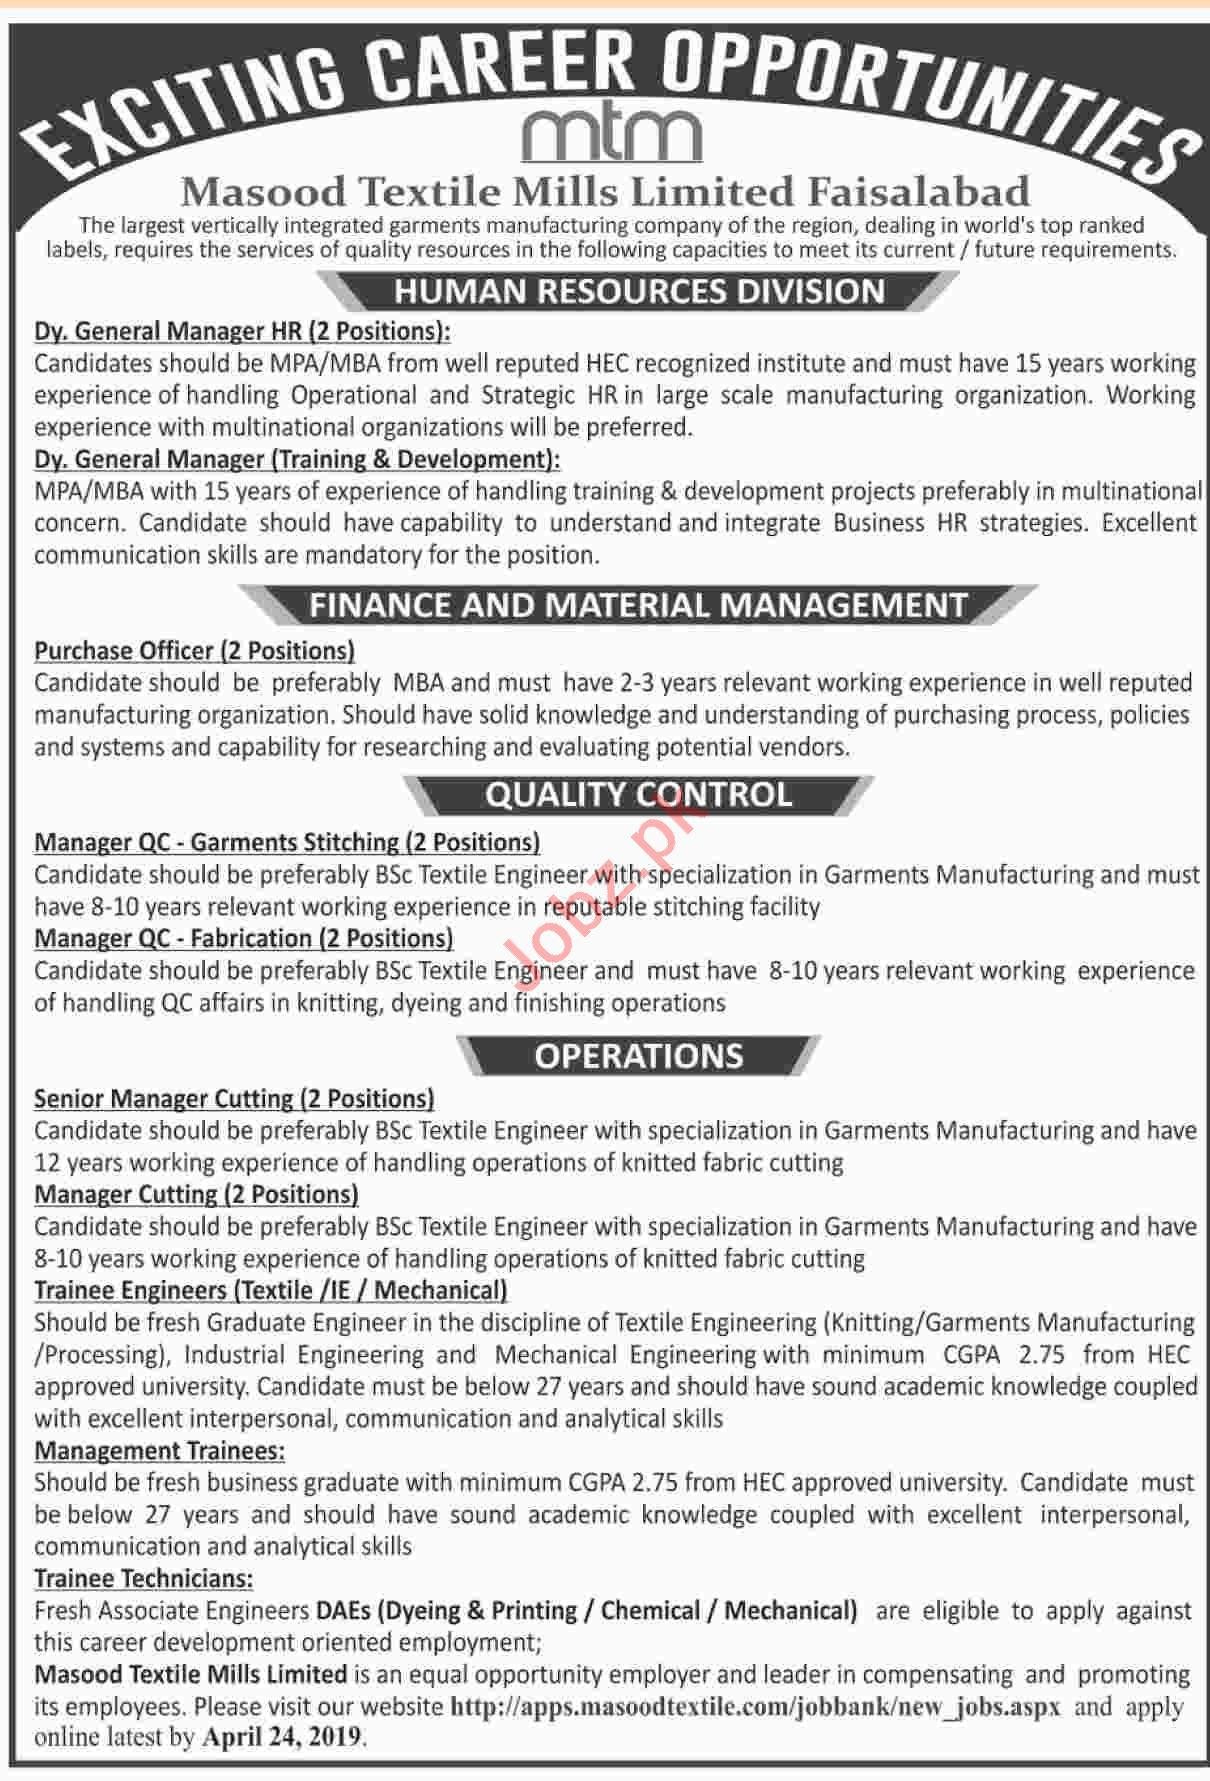 Masood Textile Mills Limited Management Job 2019